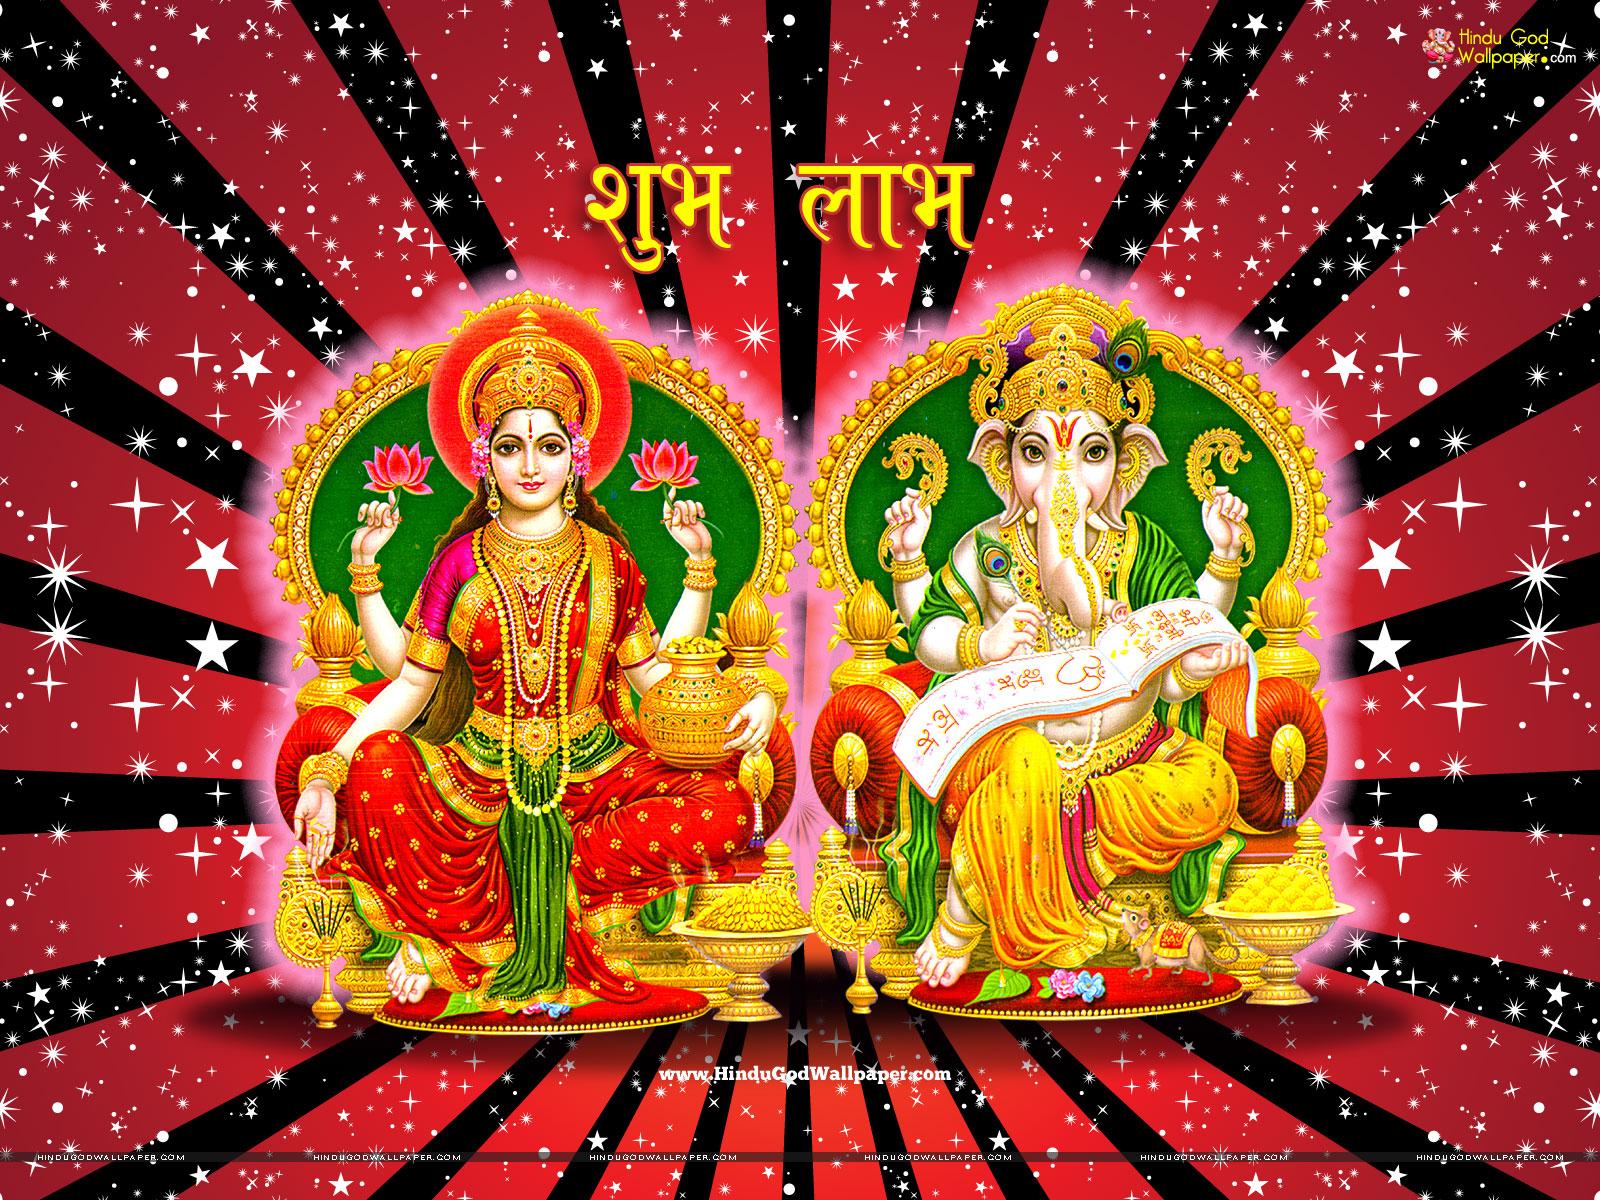 Ganesh Laxmi Diwali Hd Wallpaper Free Download